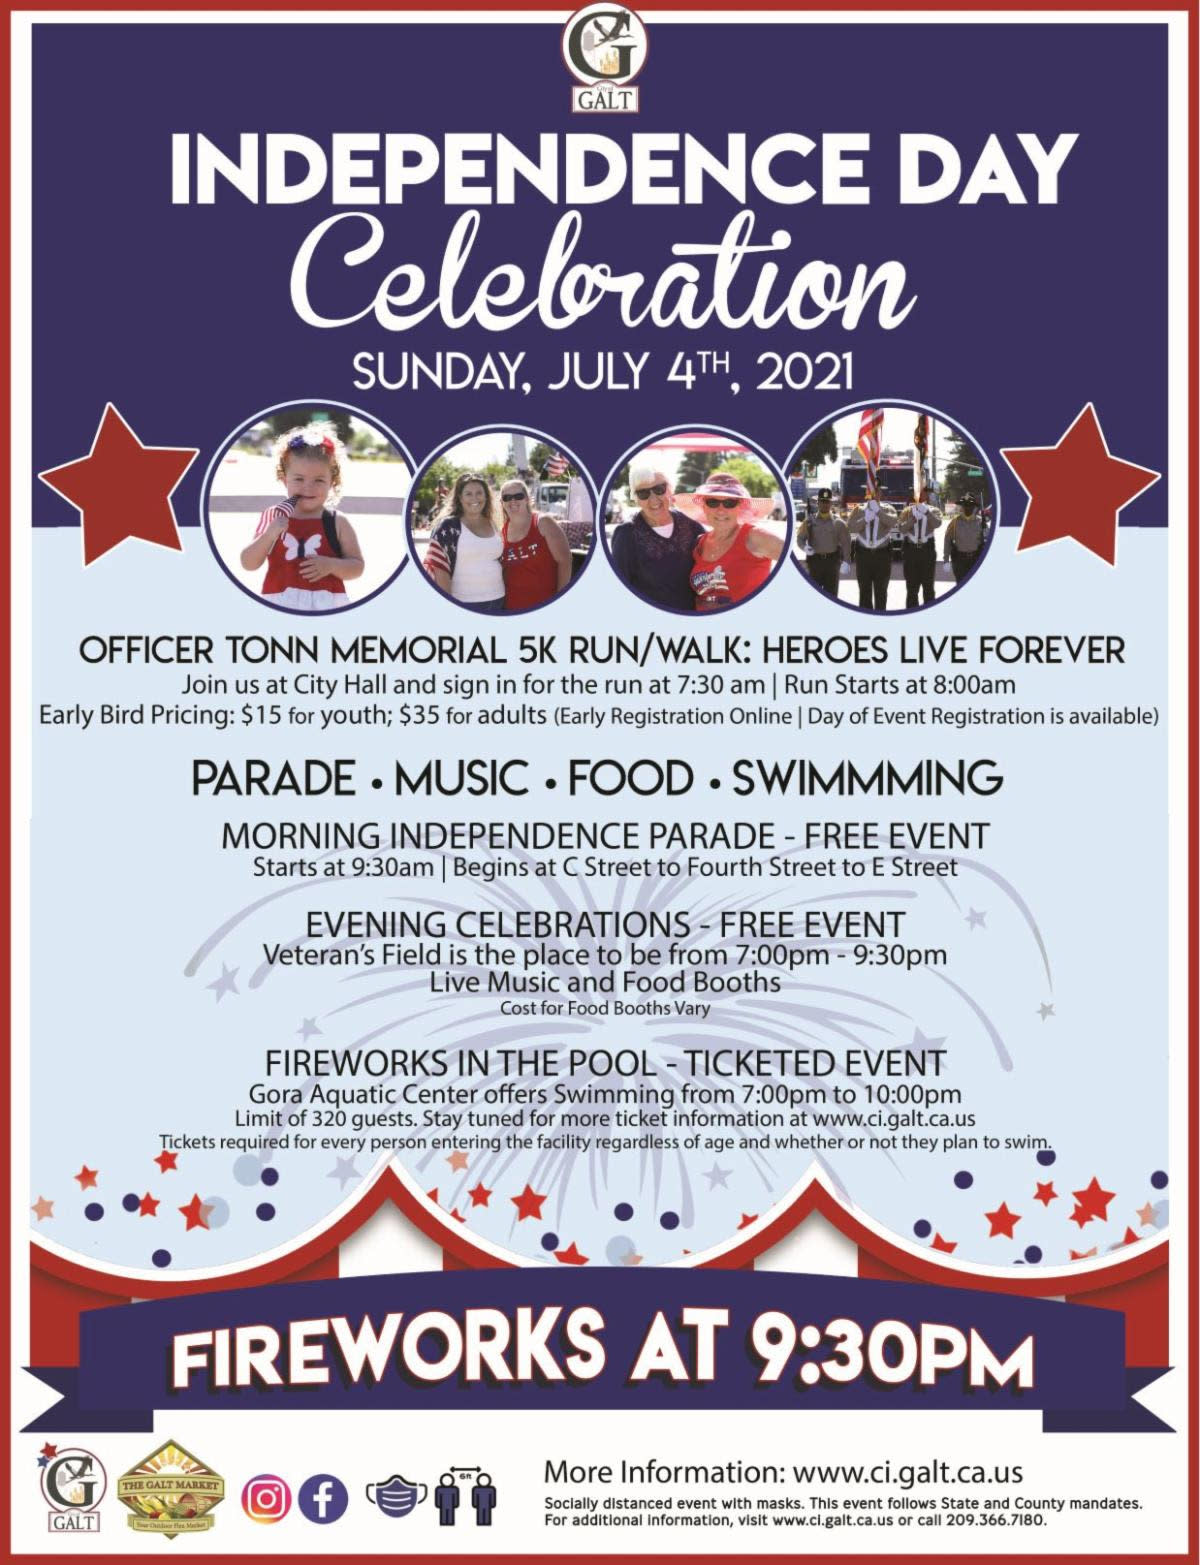 City of Galt Independence Day Celebration flyer - July 4 2021